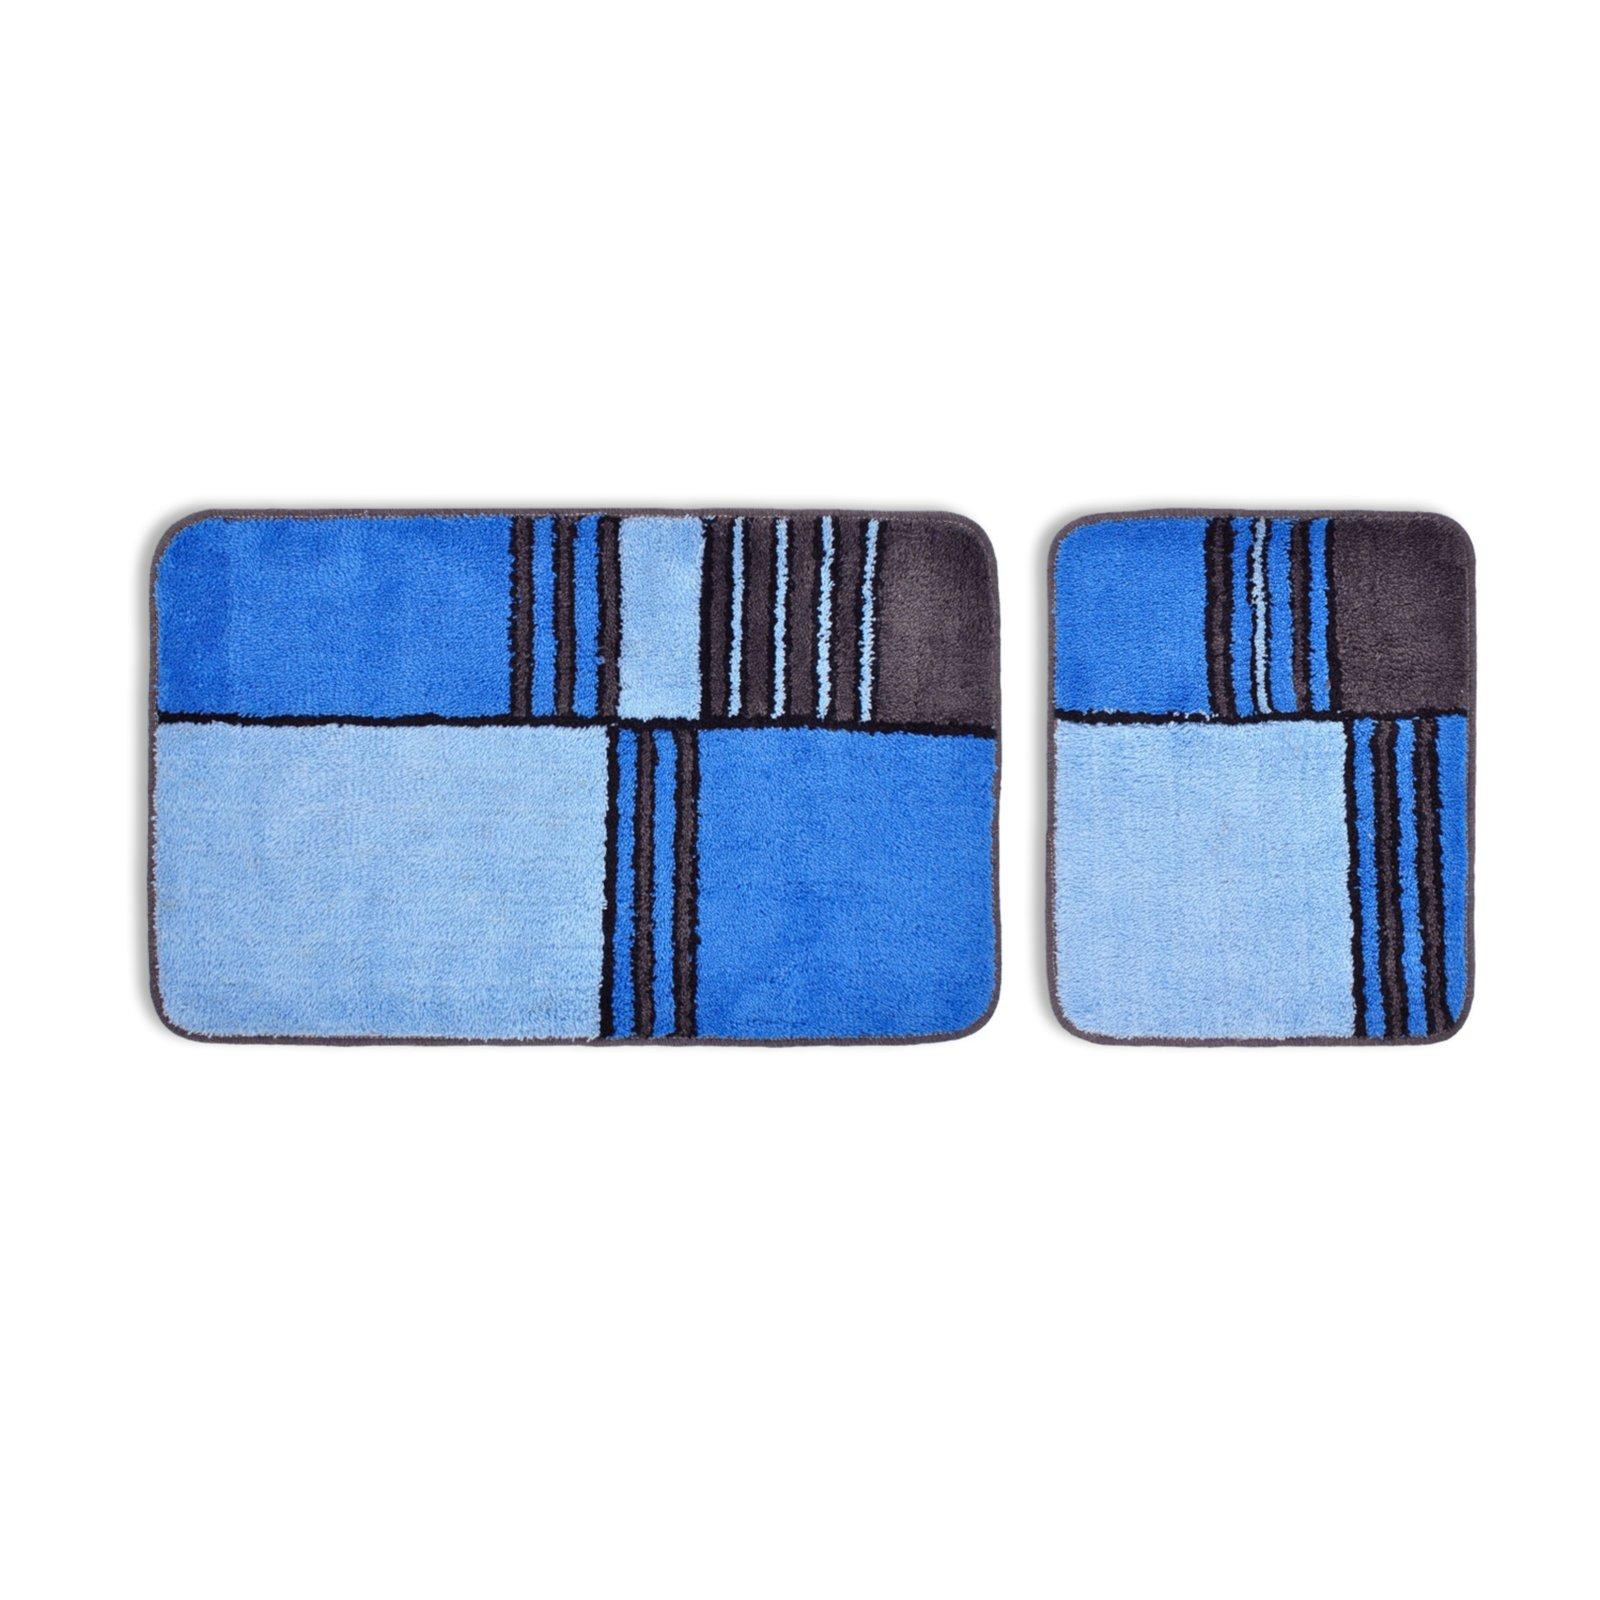 badgarnitur marlin blau 2 teilig badteppiche matten badtextilien heimtextilien. Black Bedroom Furniture Sets. Home Design Ideas